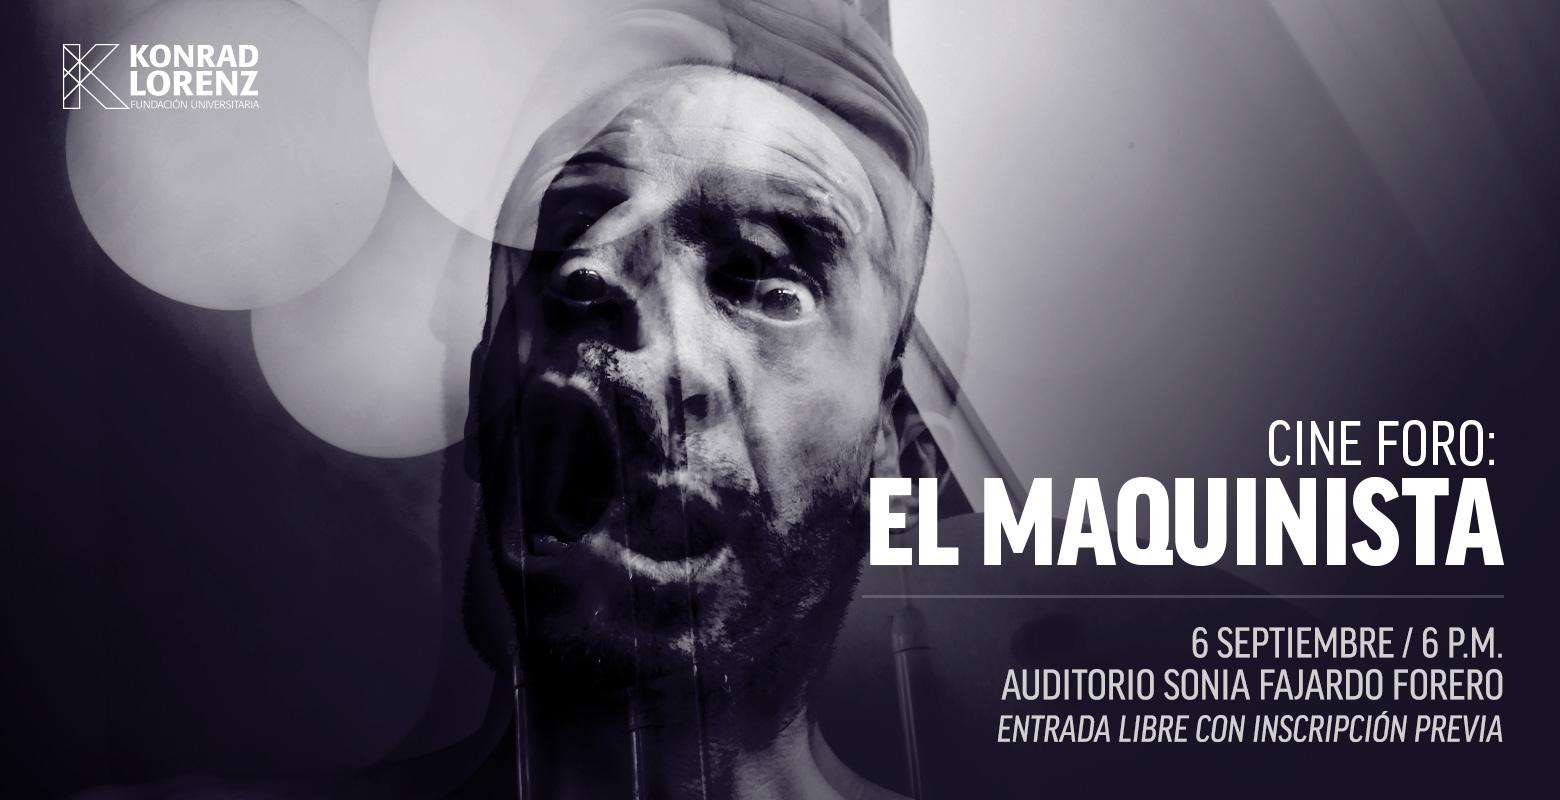 Cine foro: El maquinista